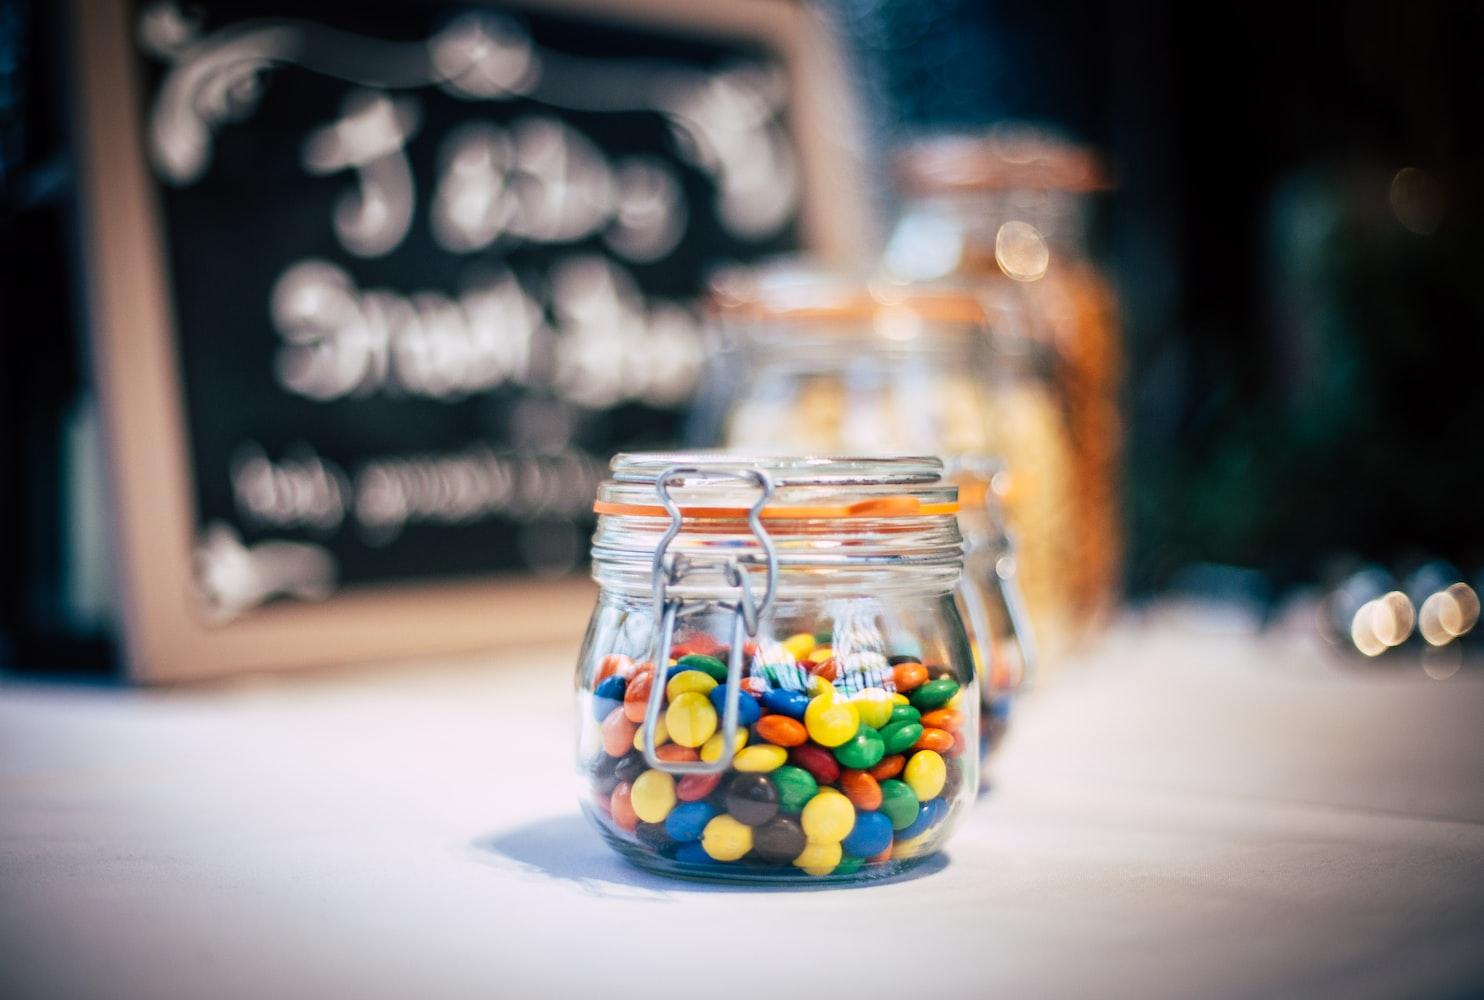 m&m chocolates inside glass jar